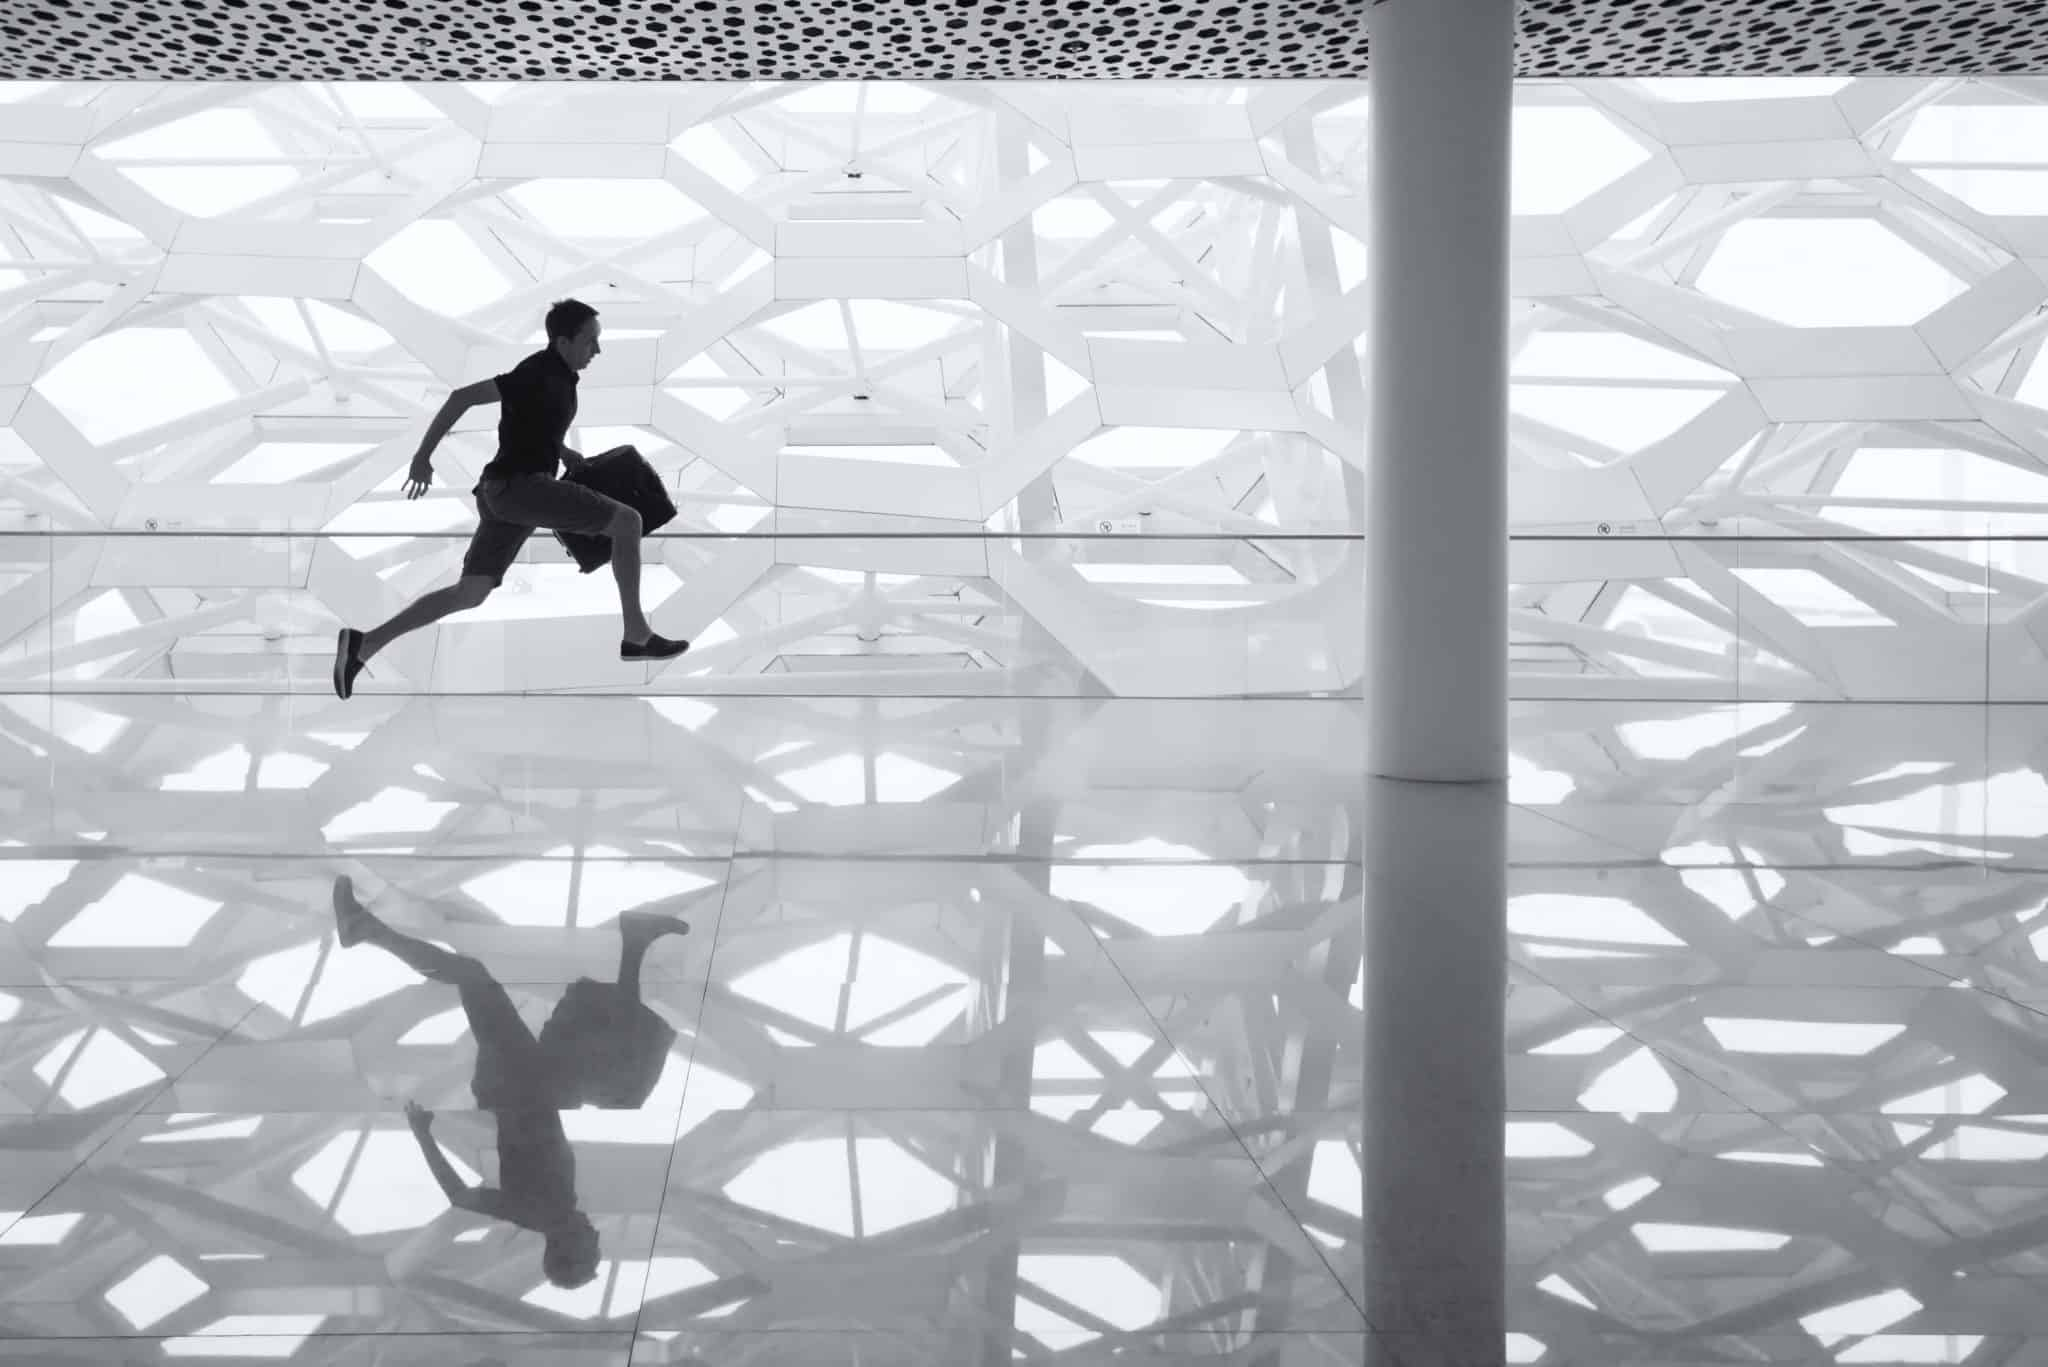 2019-10-18-azubi-kick-start-Runsplash-web